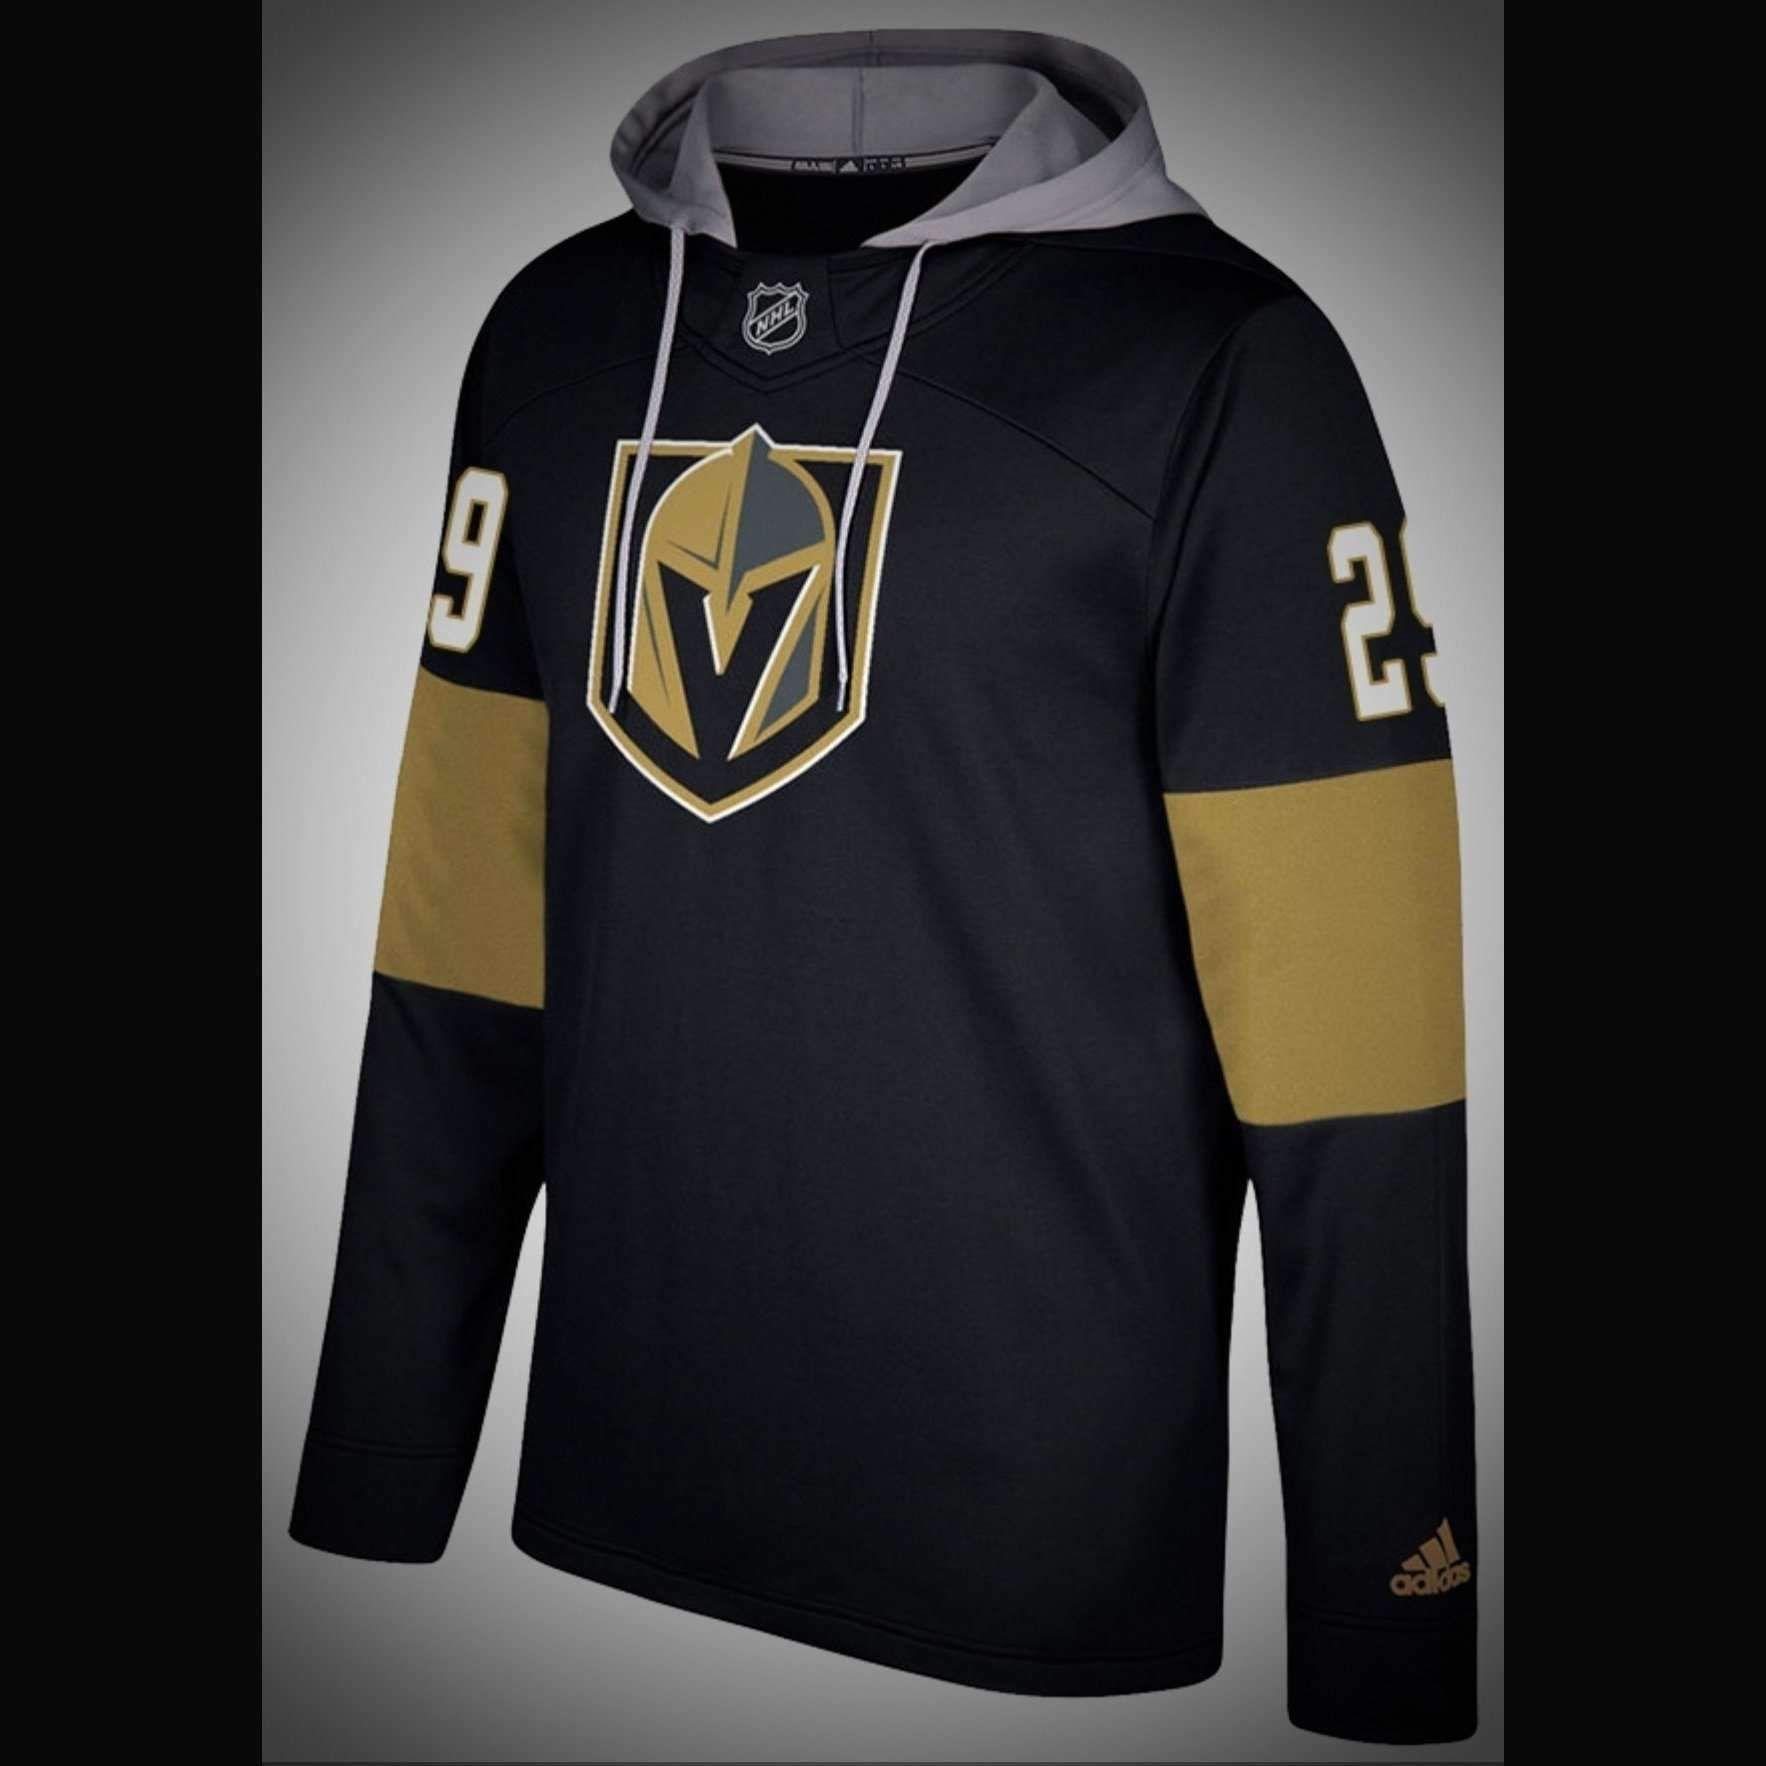 brand new f2f5b 2c708 Vegas Golden Knights Adidas NHL Hockey Jersey Style Hoodie ...